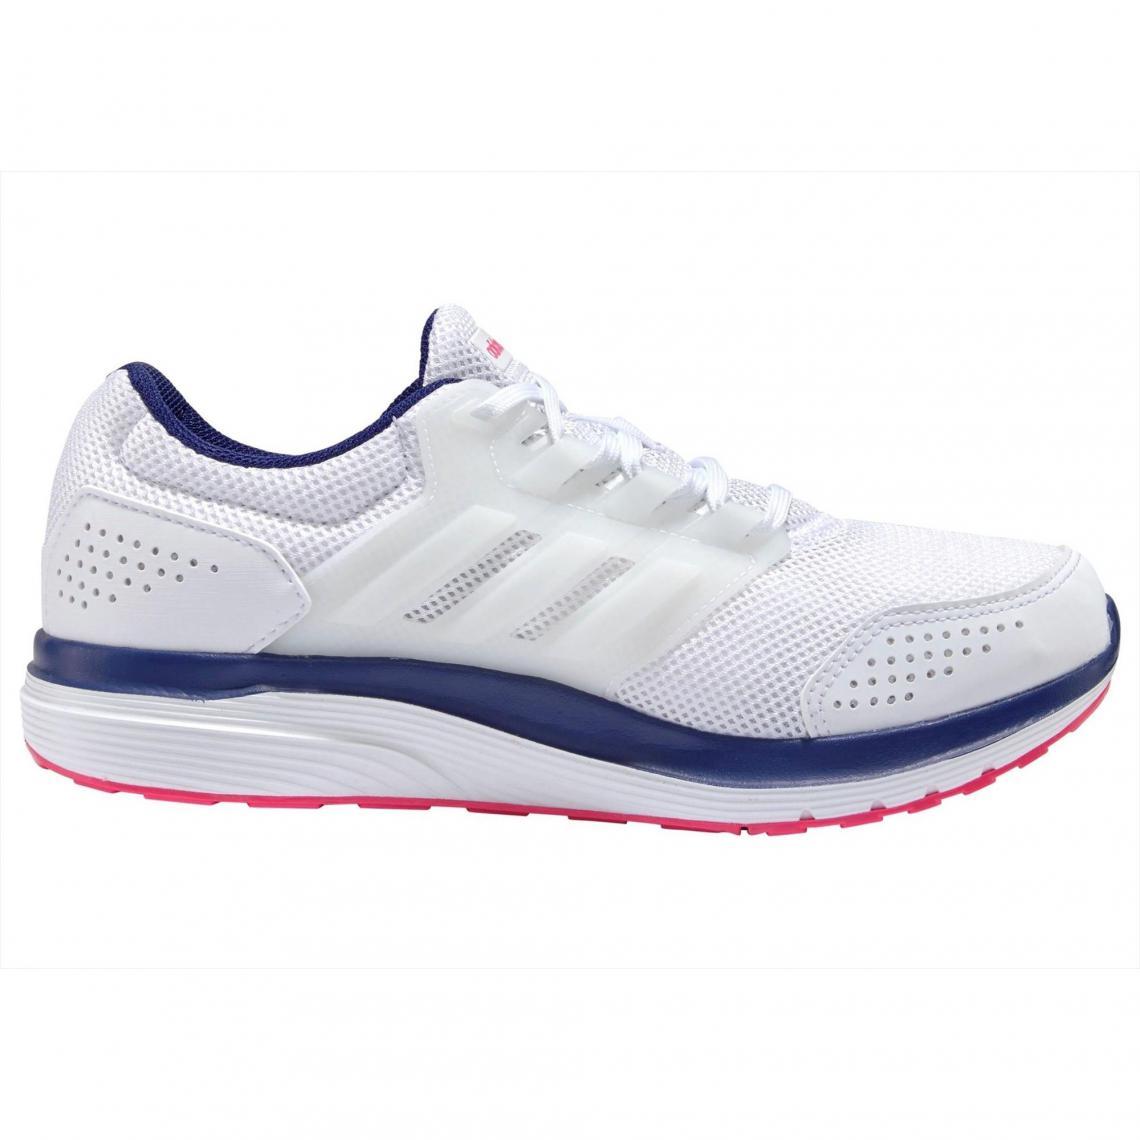 Baskettes homme Galaxy 4 W Q2 de Adidas Blanc Bleu | 3